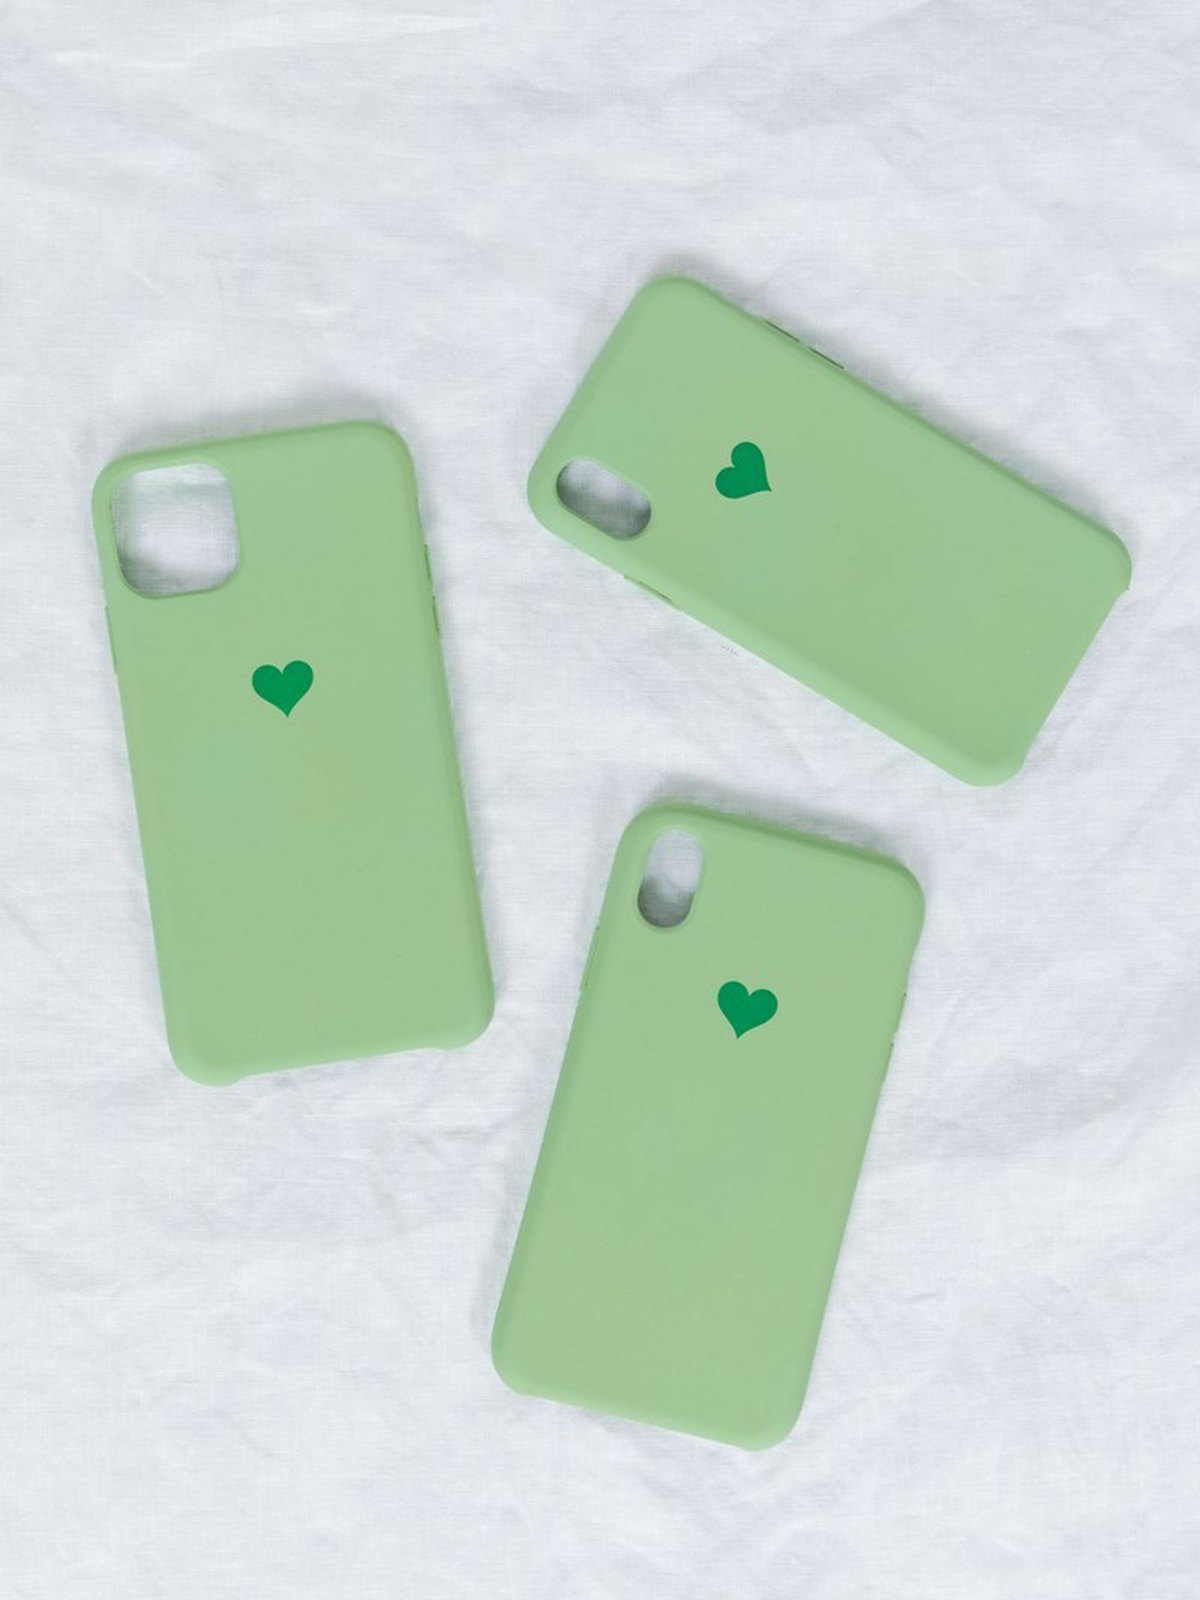 1Pcs Heart-shaped Iphone Cases - Green iPhone 12Mini